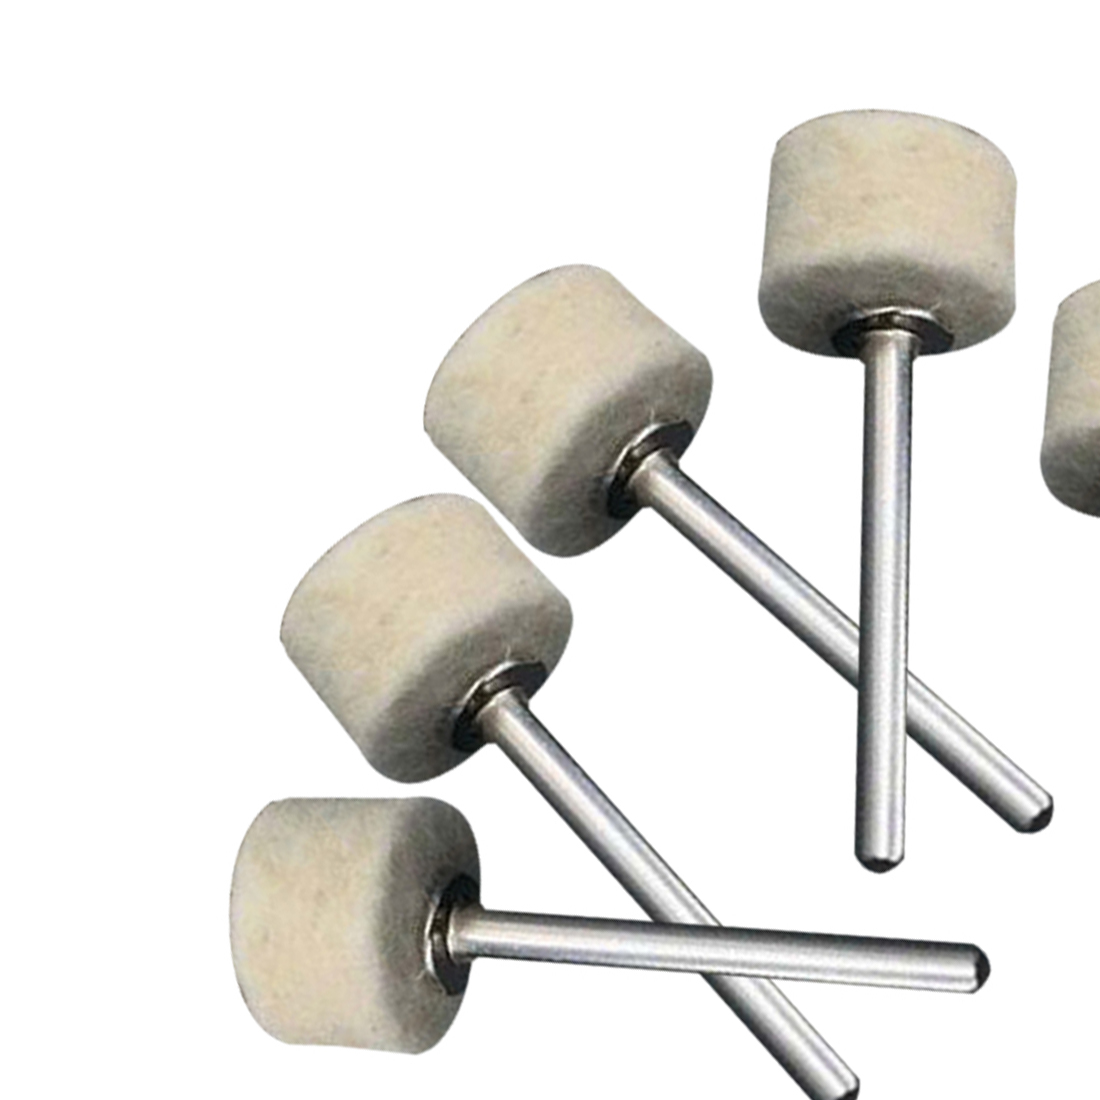 50Pcs 13mm Wool Felt Polishing Buffing Wheel La Rueda De Rueda De Moler+2Pcs 3.2 Mm Shanks For Rotary Tool Accessories